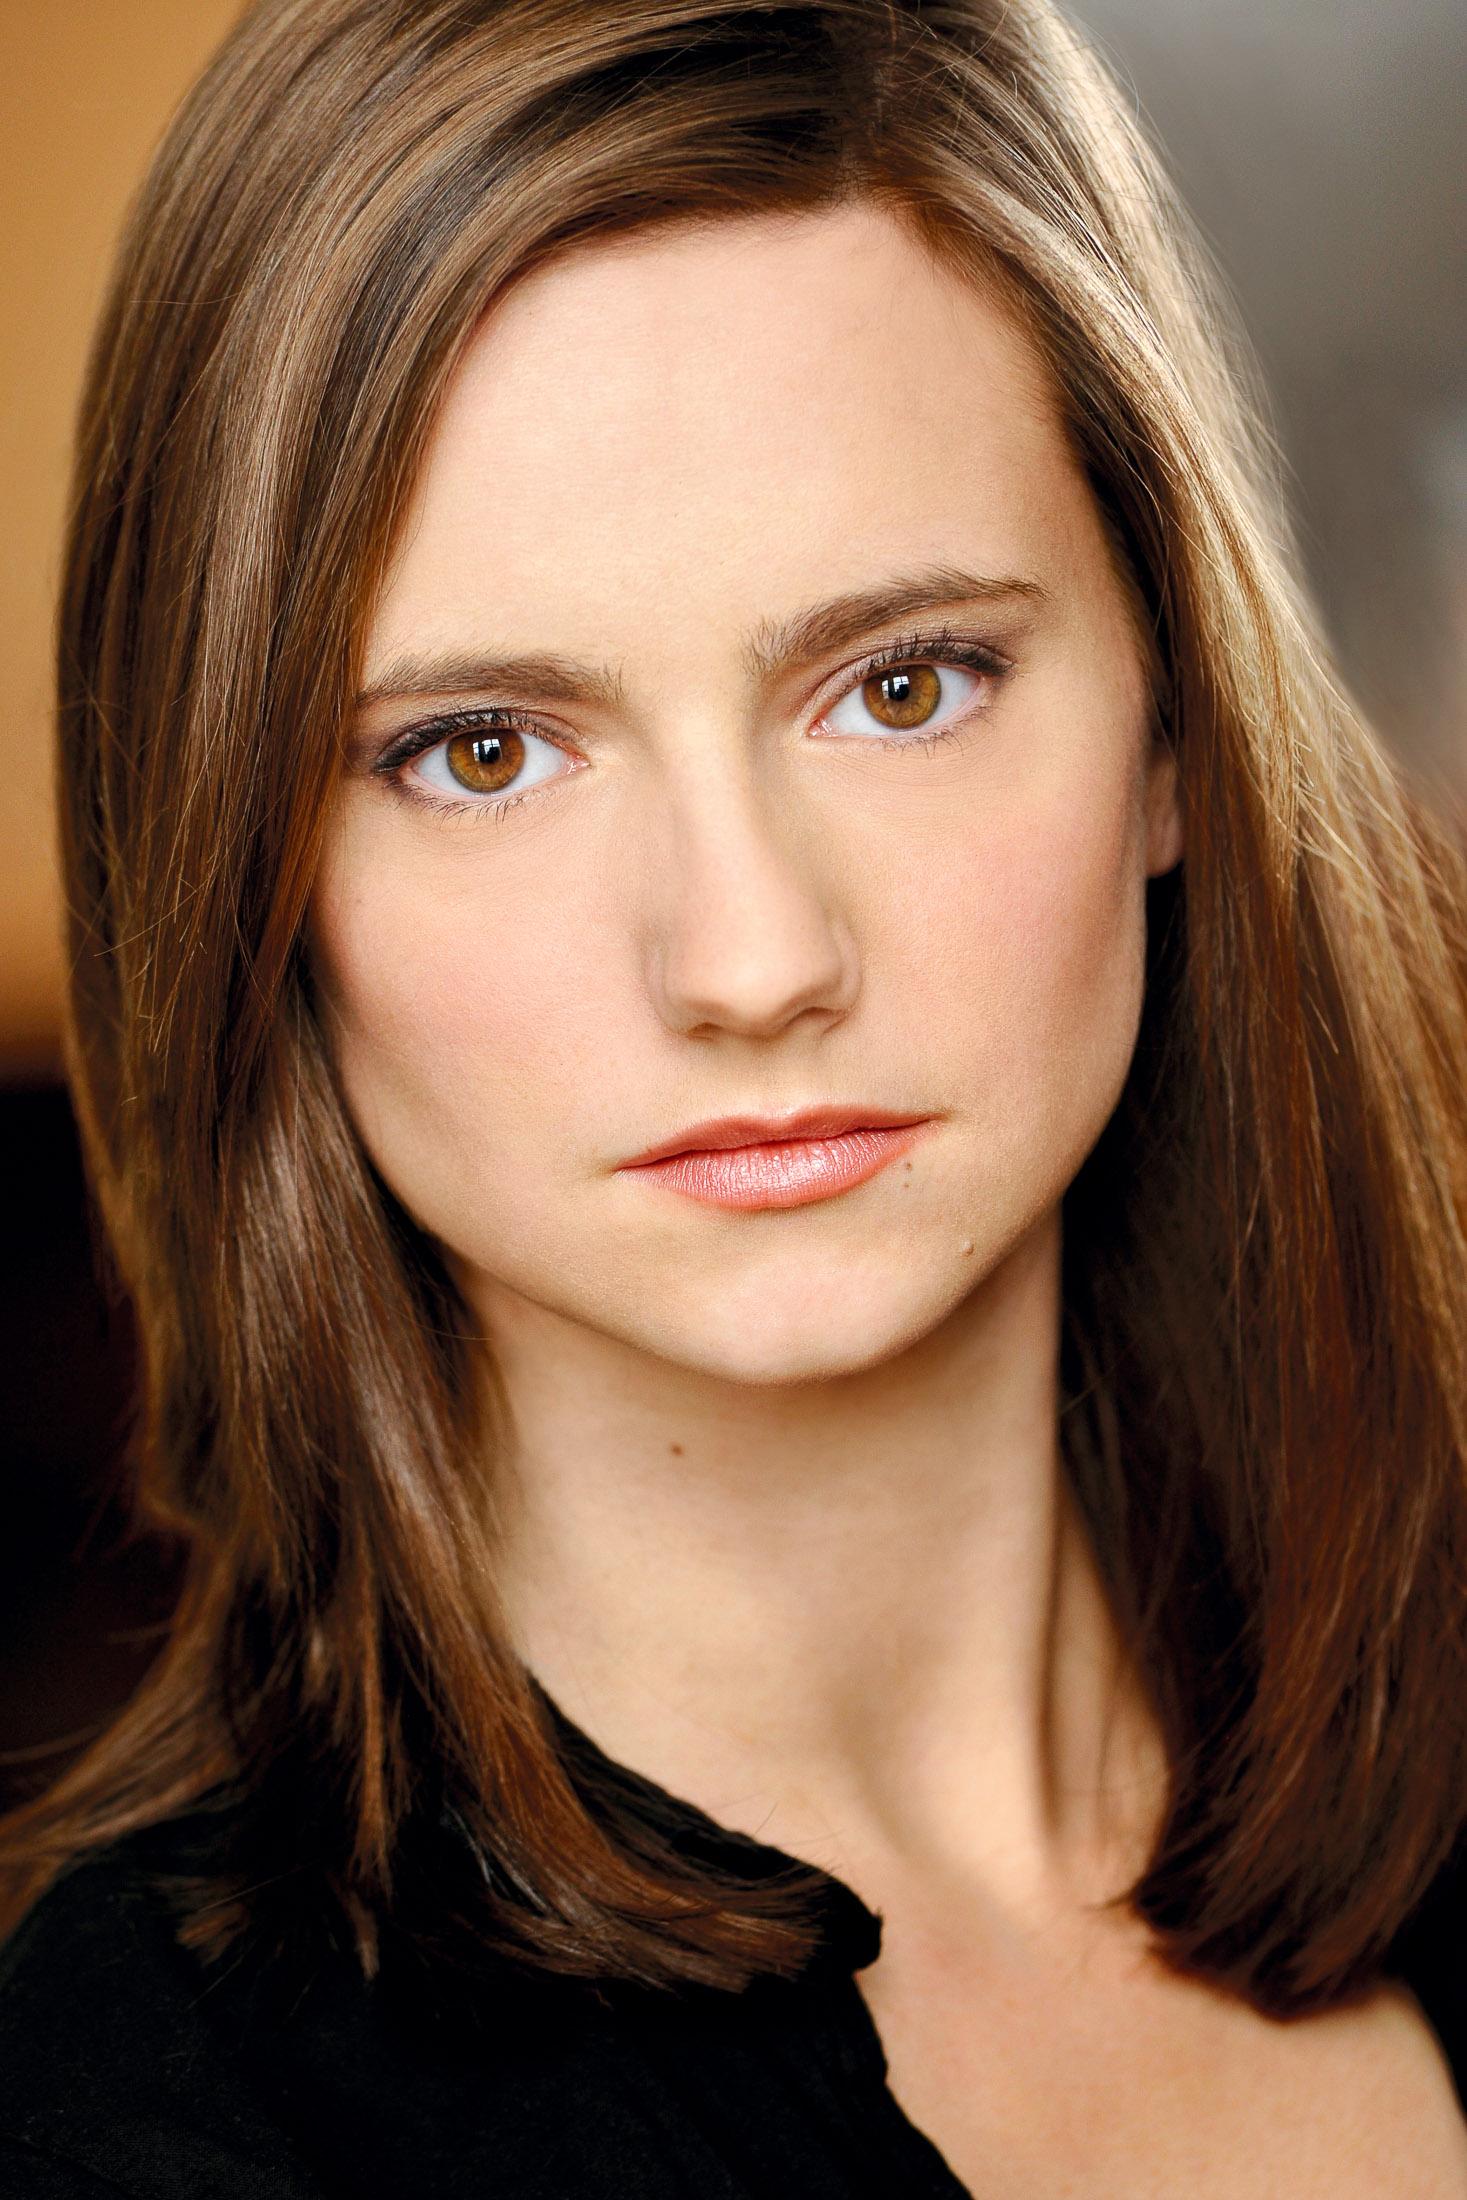 Headshots NYC - Actor Headshots Leslie G